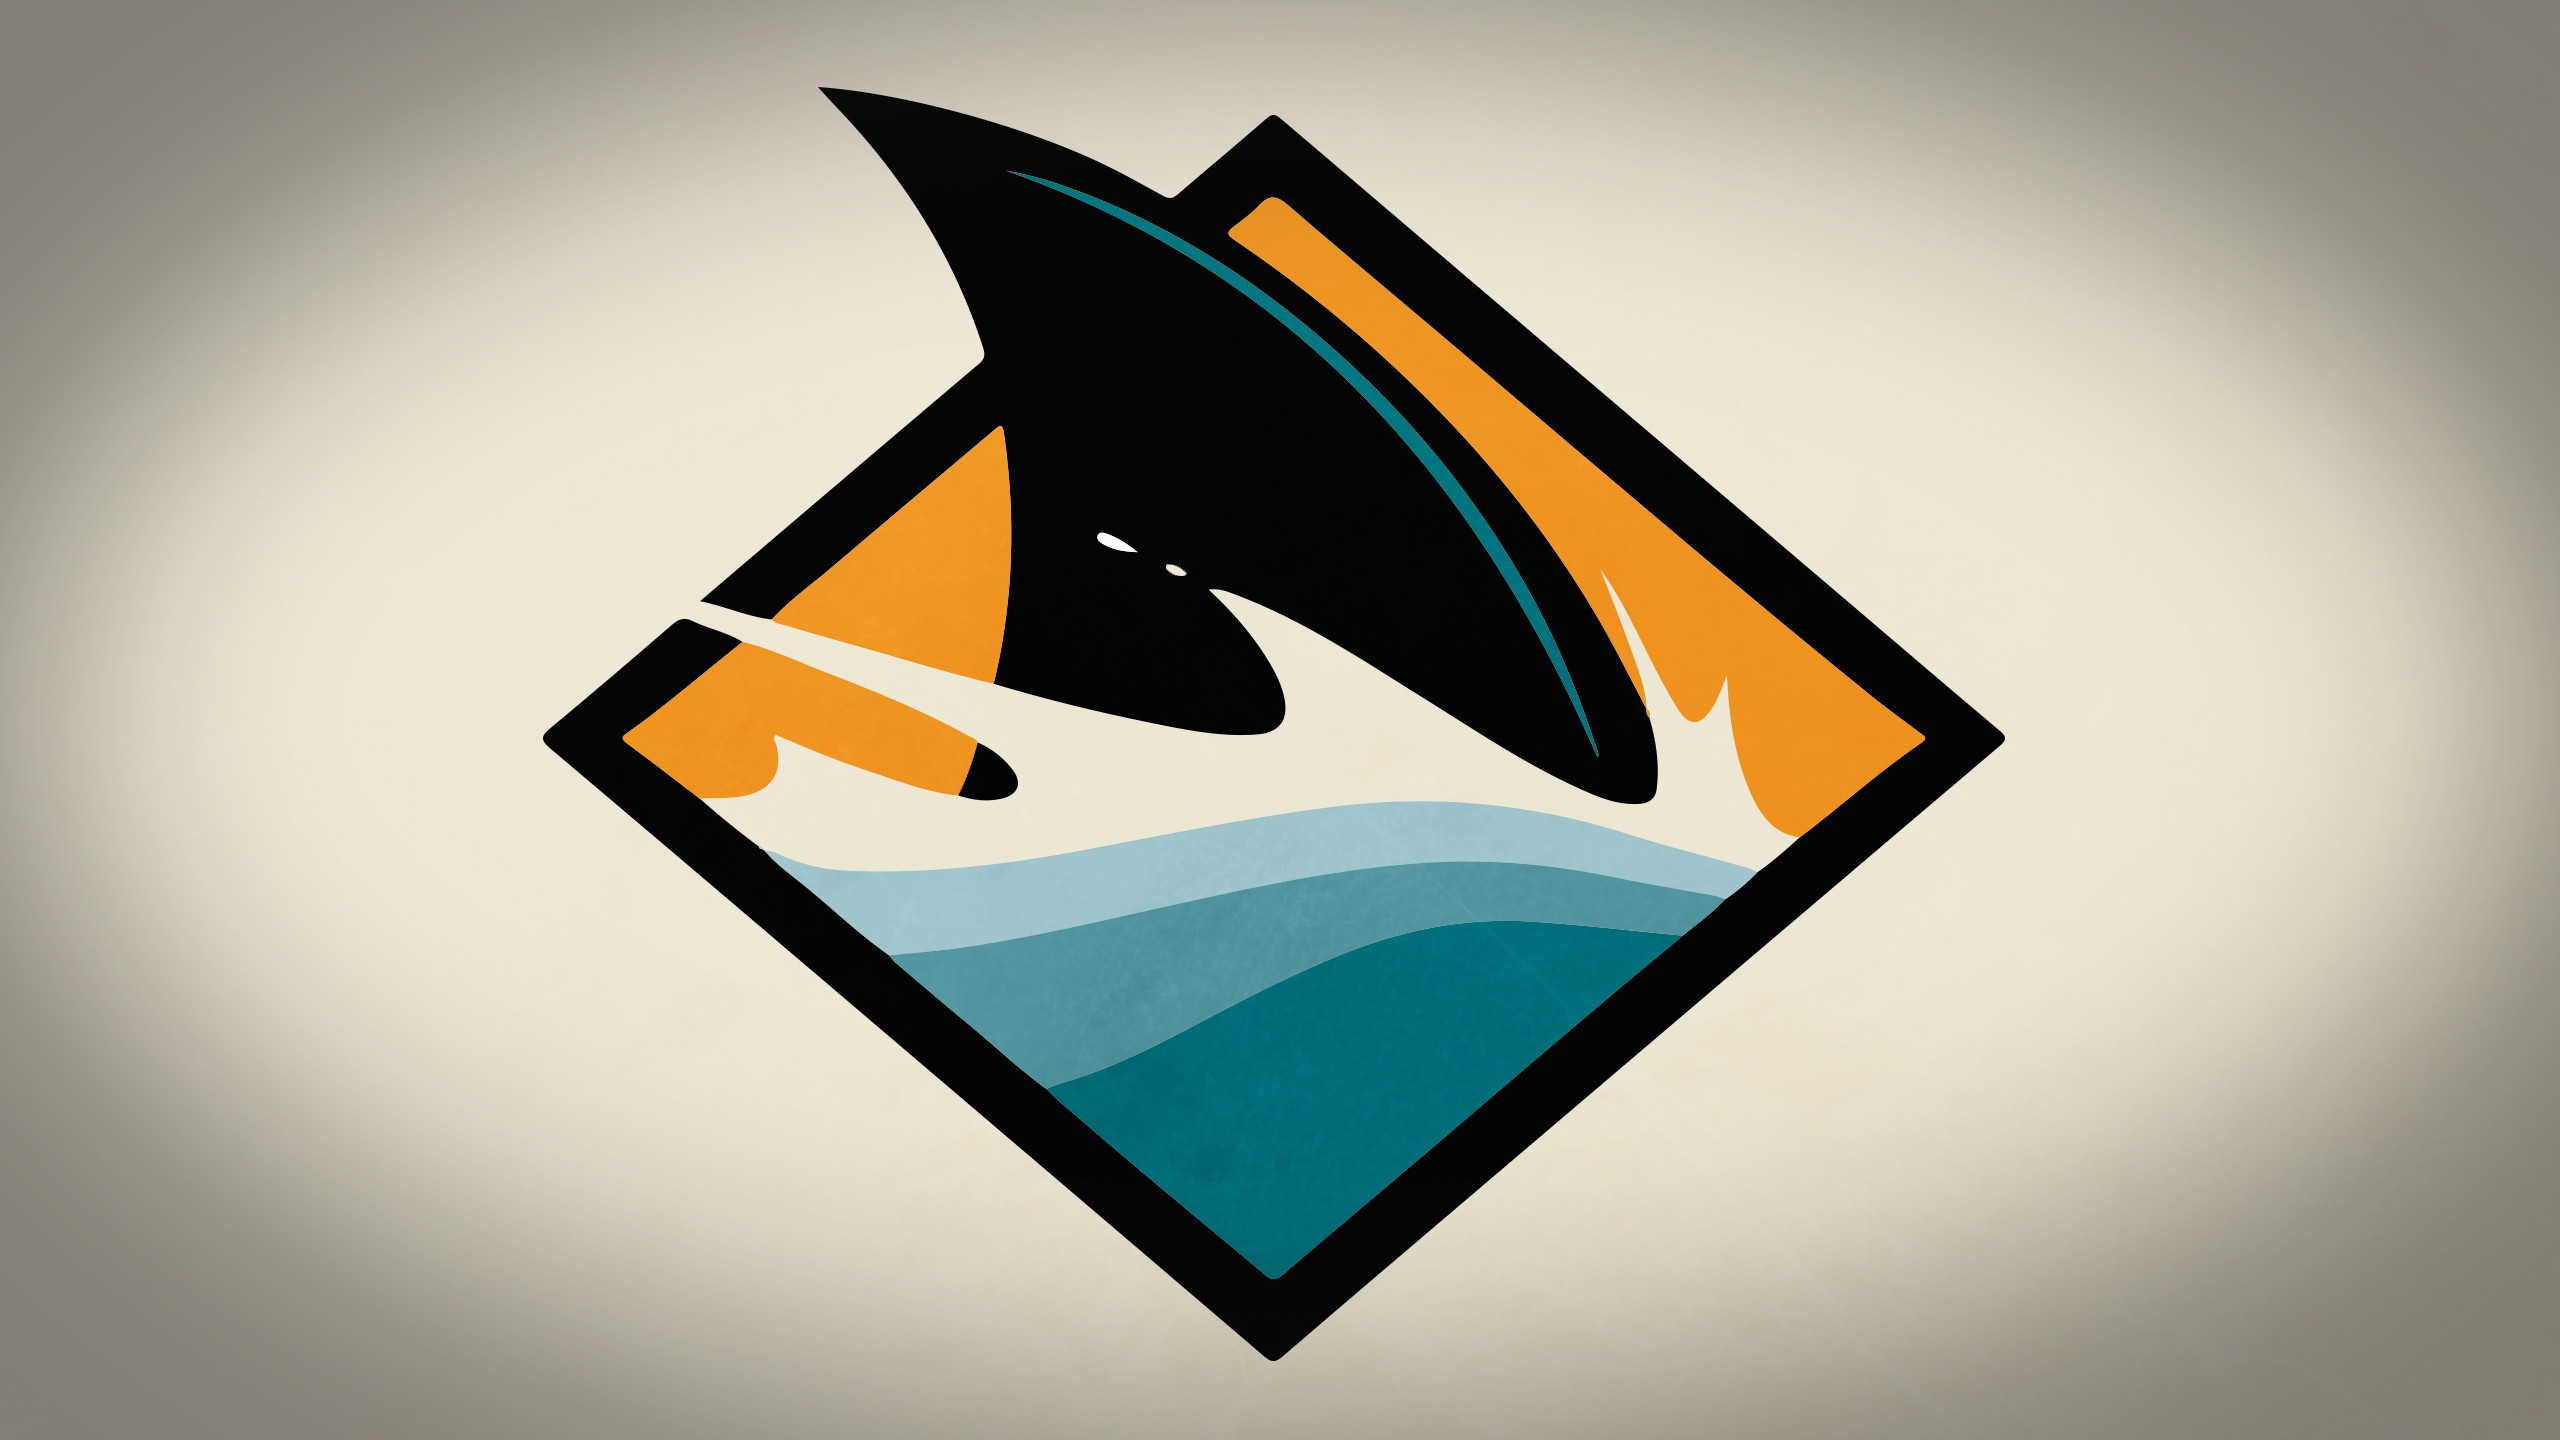 San Jose Sharks Computer Wallpapers Desktop Backgrounds 2560x1440 2560x1440